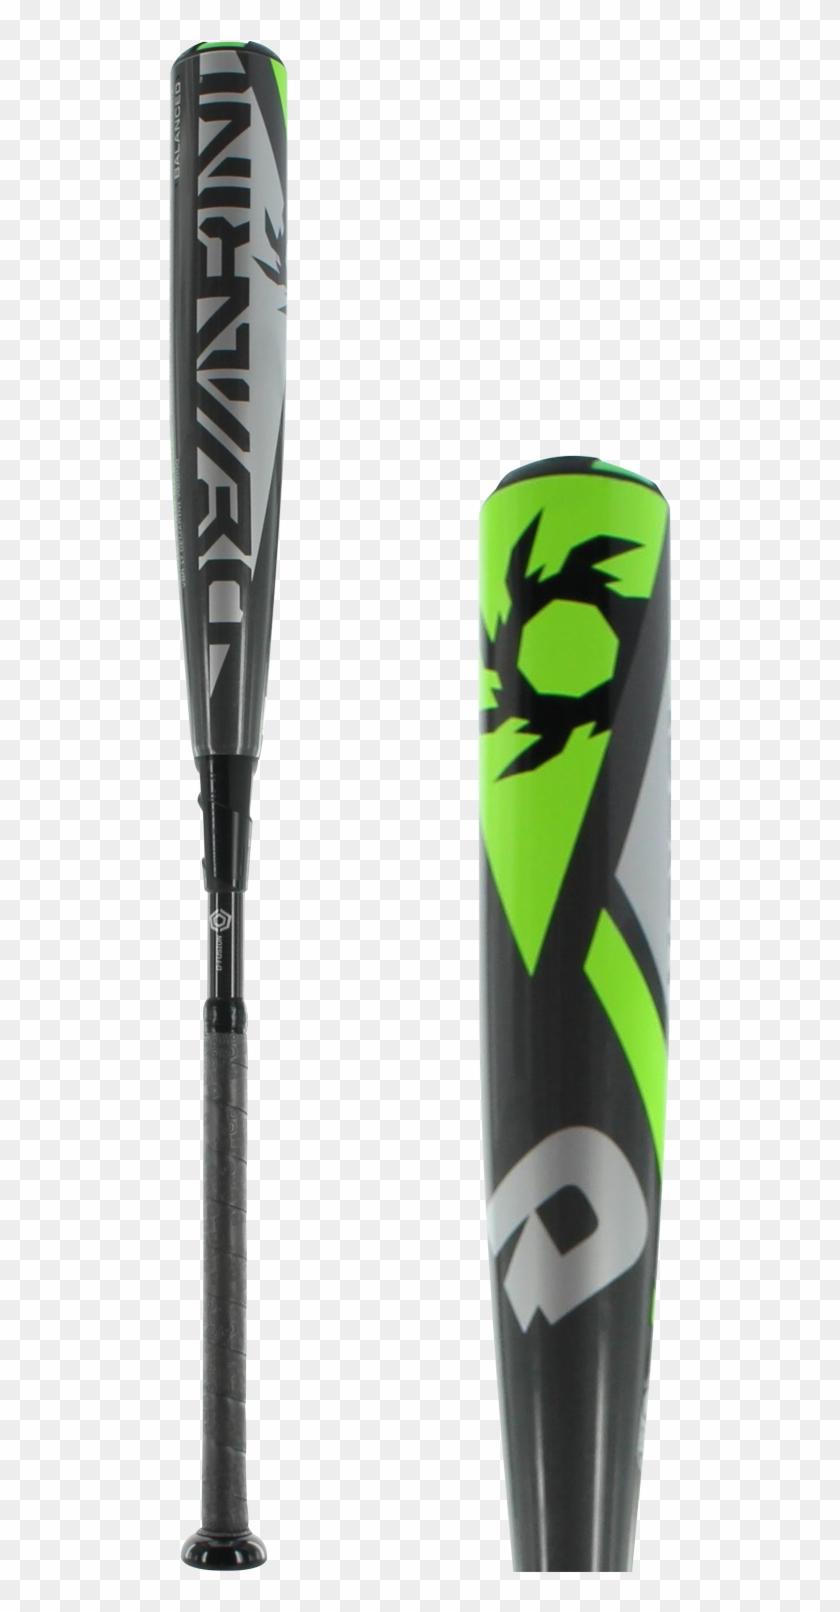 New Demarini Voodoo Vbr-17 Senior League Baseball Bat - Demarini Voodoo Insane 2017 Clipart #1020887